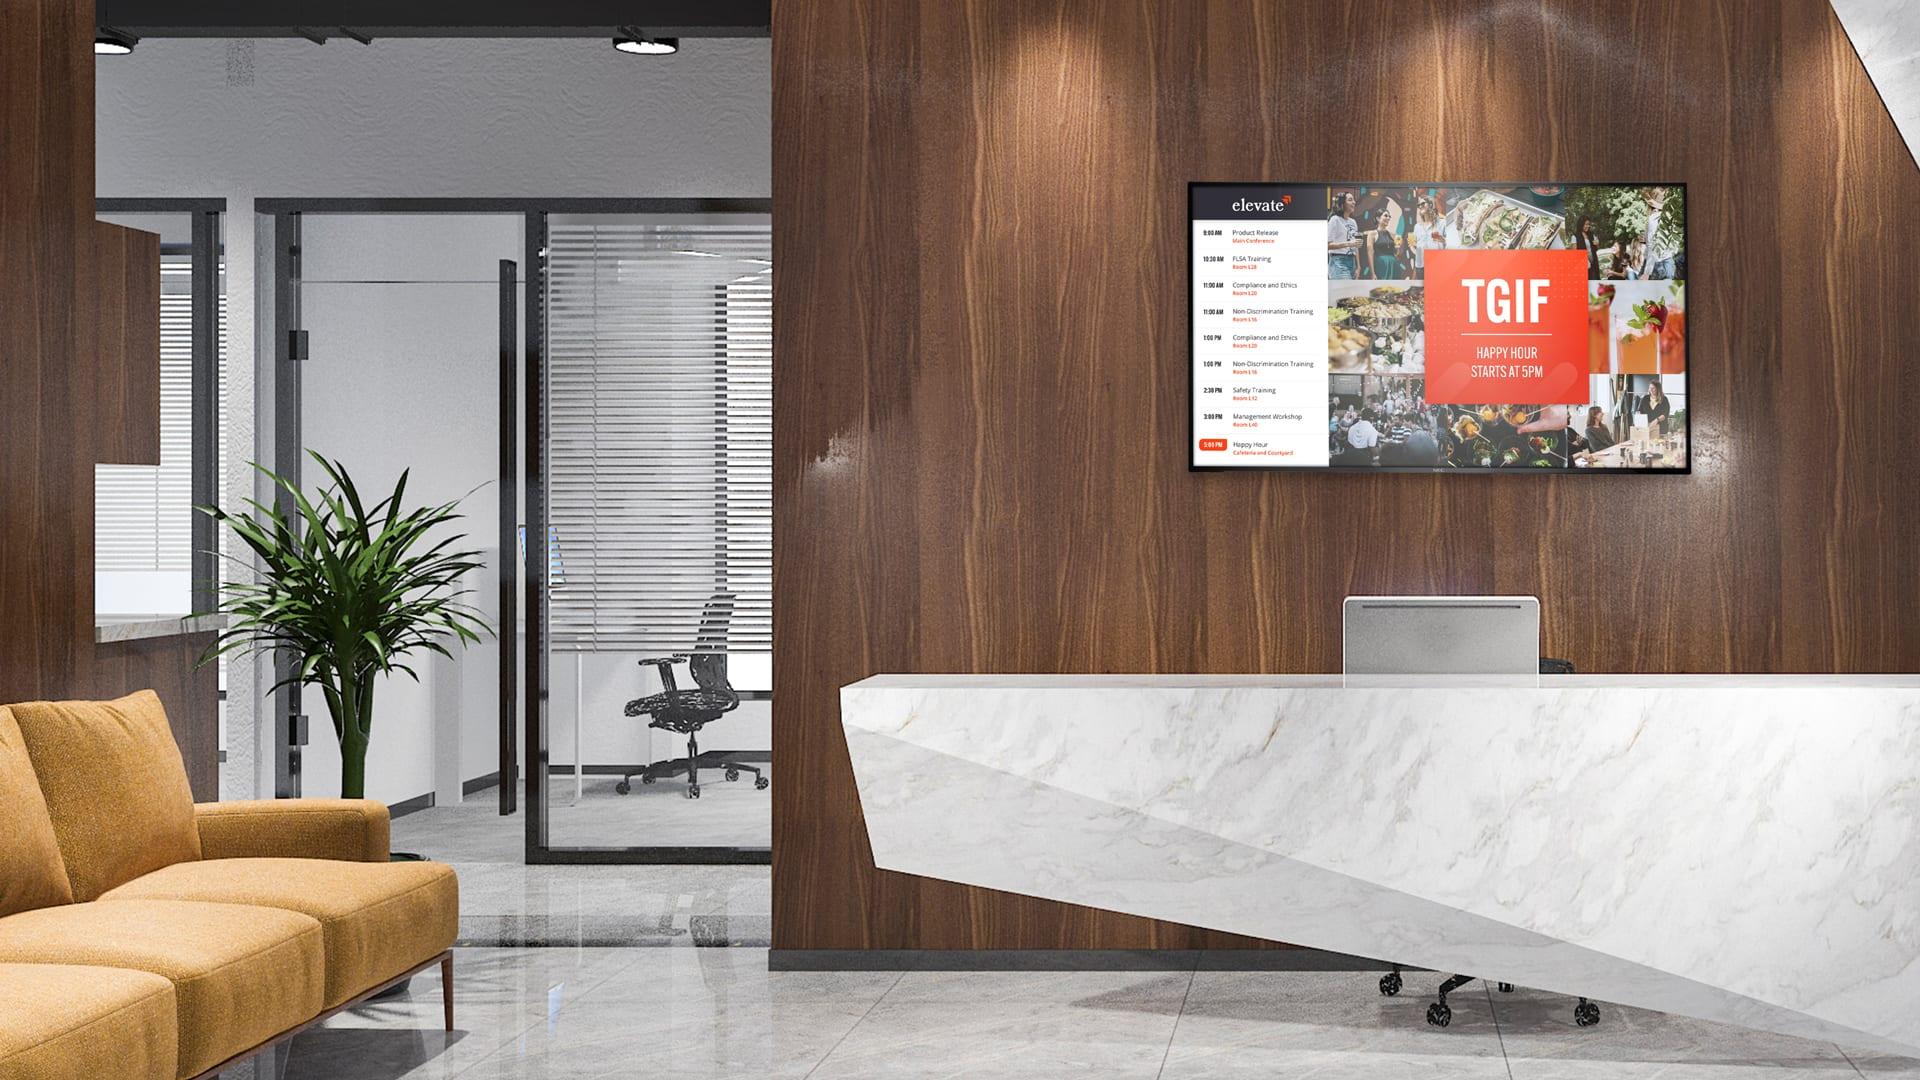 Office Lobby digital signage communication